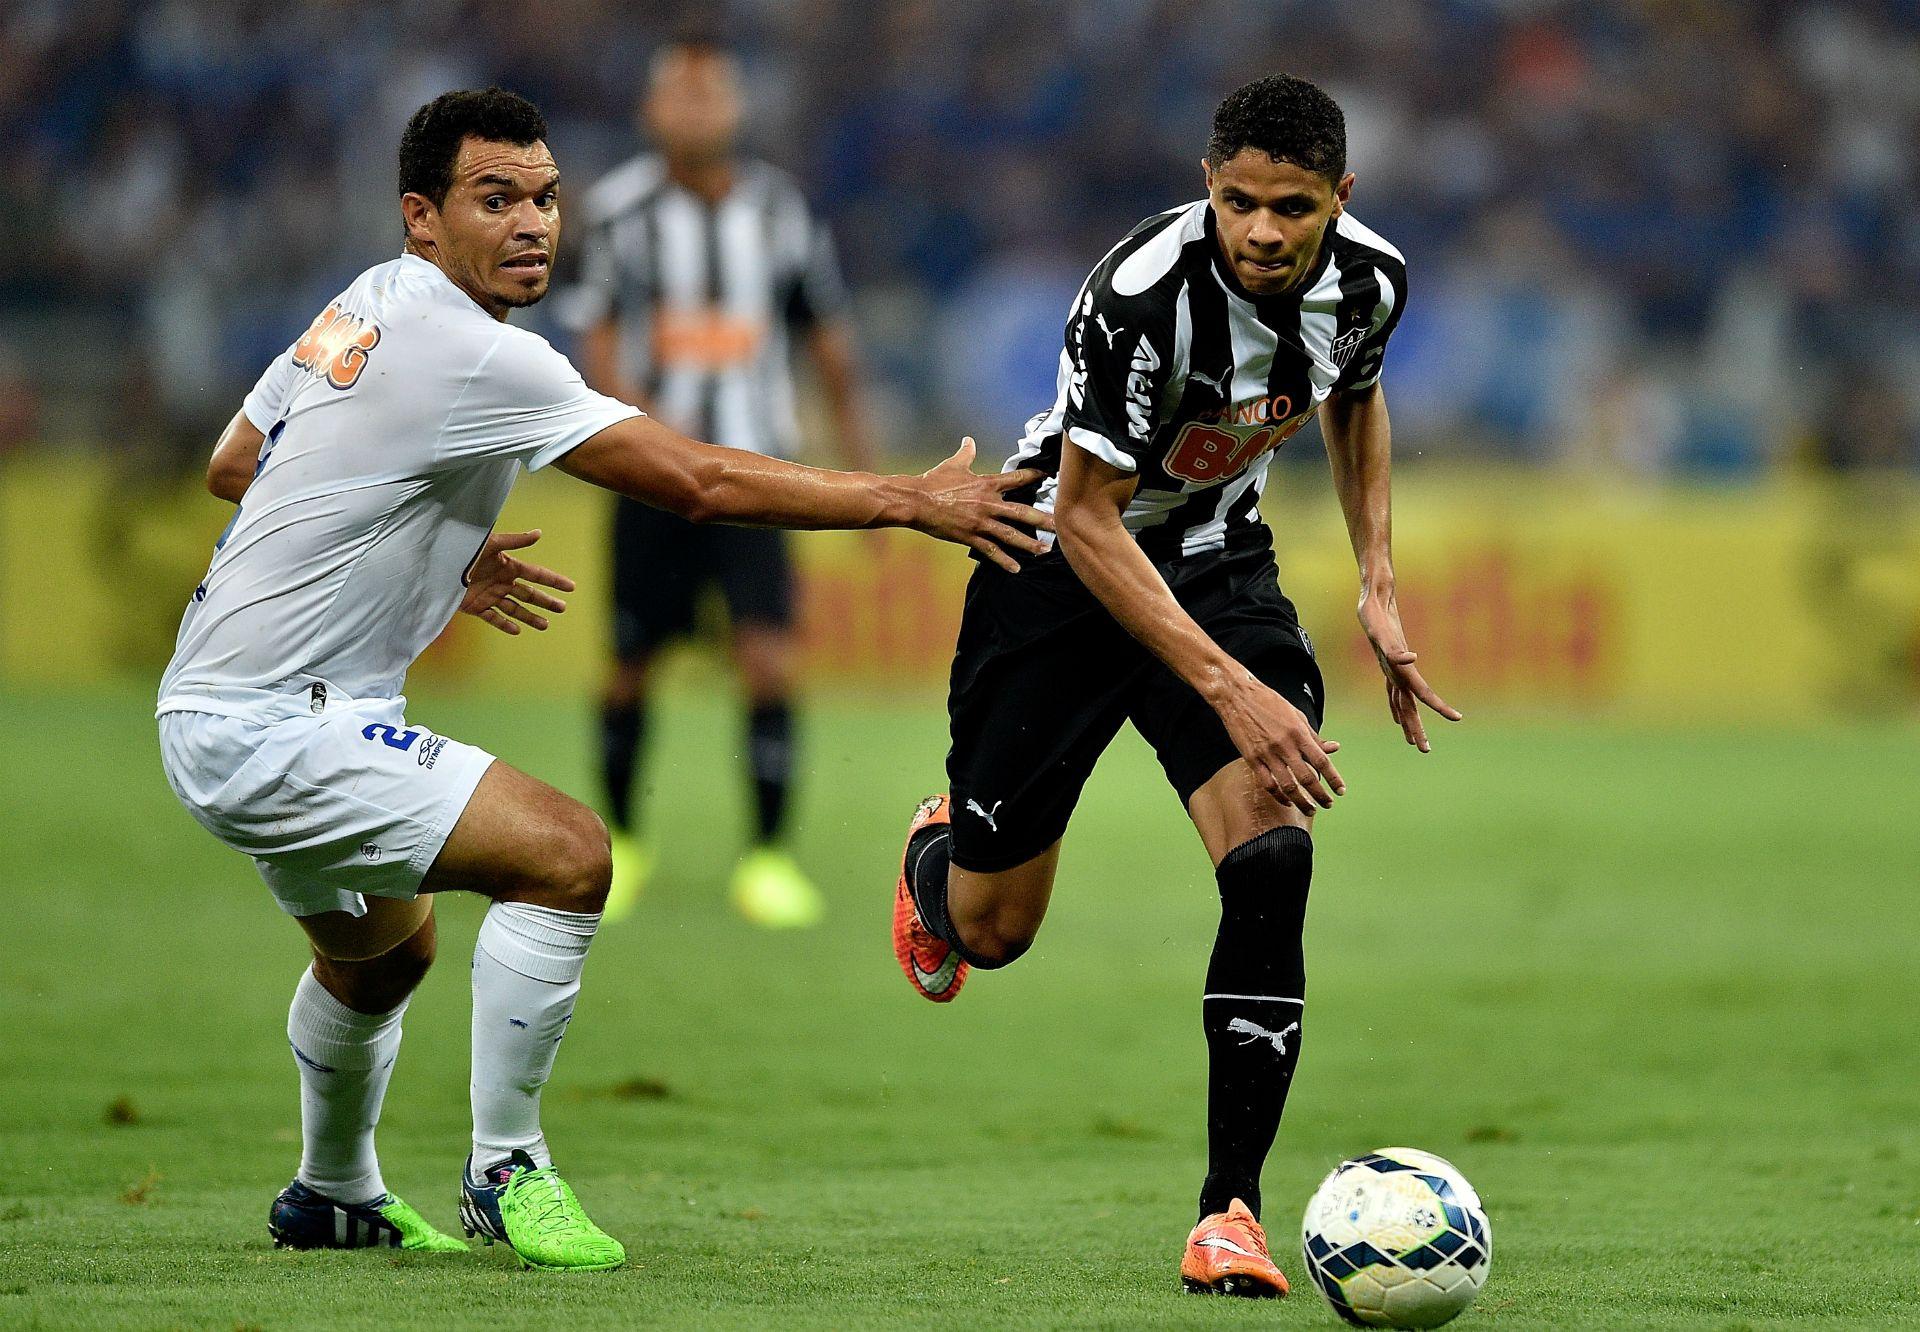 Épinglé par Jeri Lavena sur Clube Atlético Mineiro